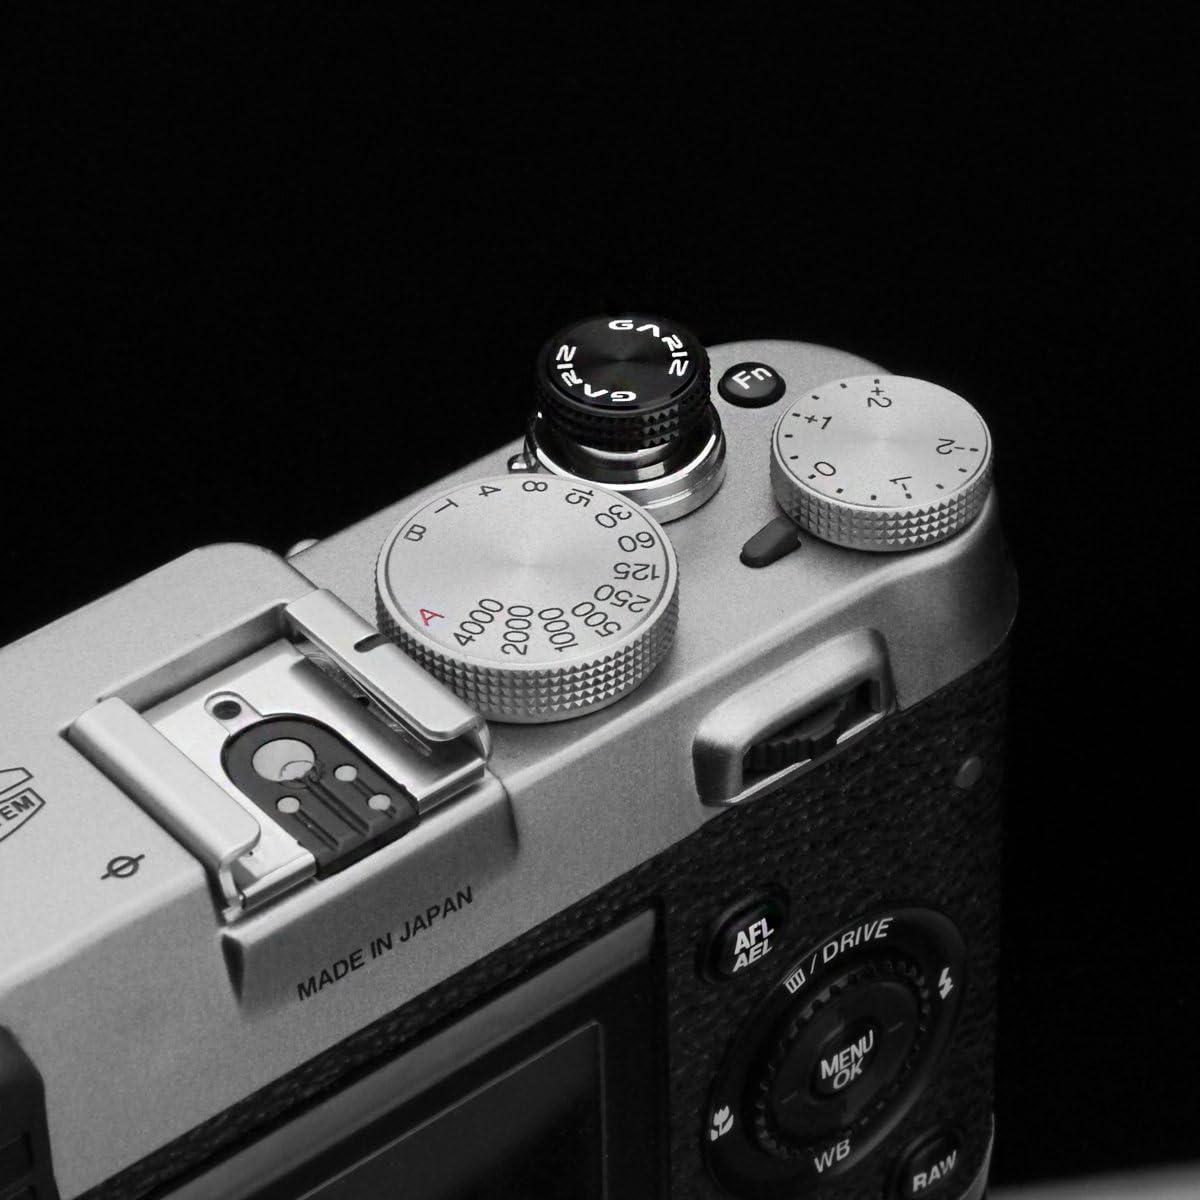 Black Gariz Metal XA-SBA1 Camera Screw Type Soft Button for X-PRO1 X100 X10 LEICA CONTAX